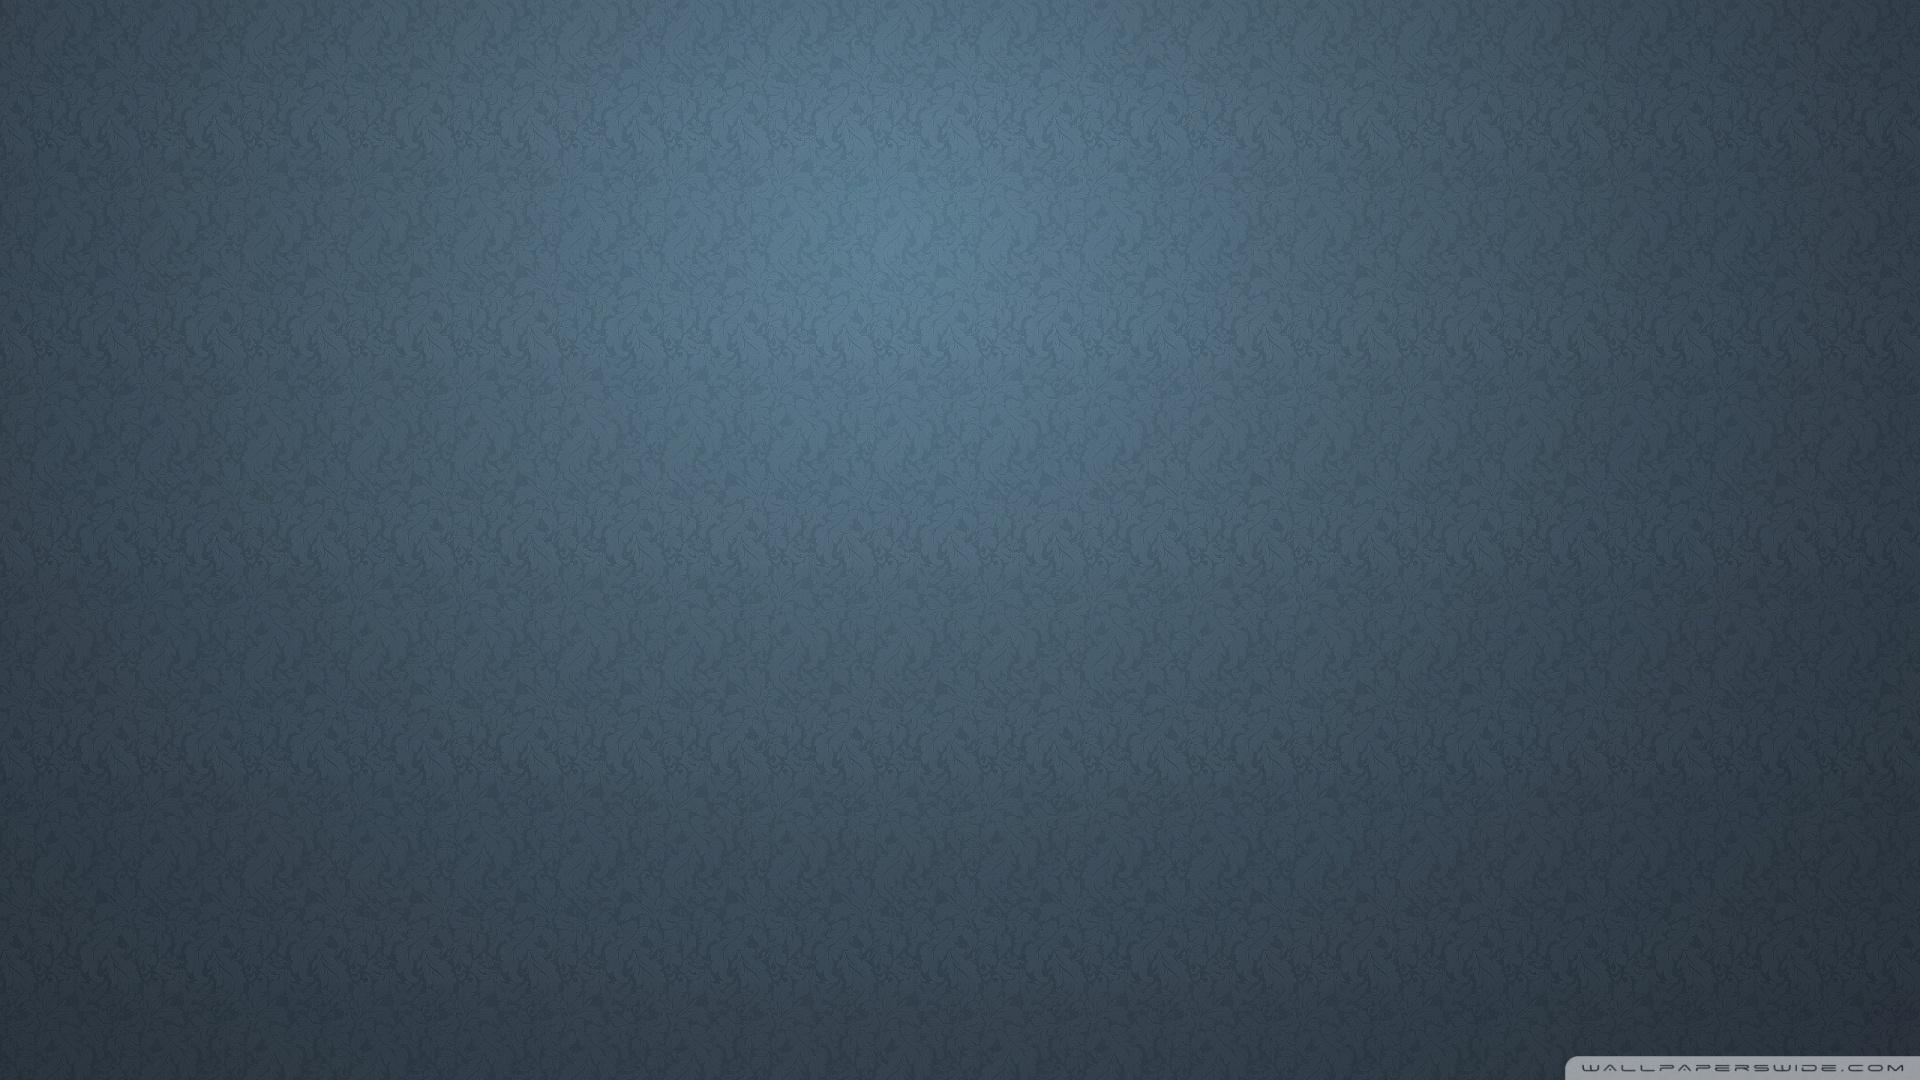 Blue Gray Color blue gray wallpaper - wallpapersafari